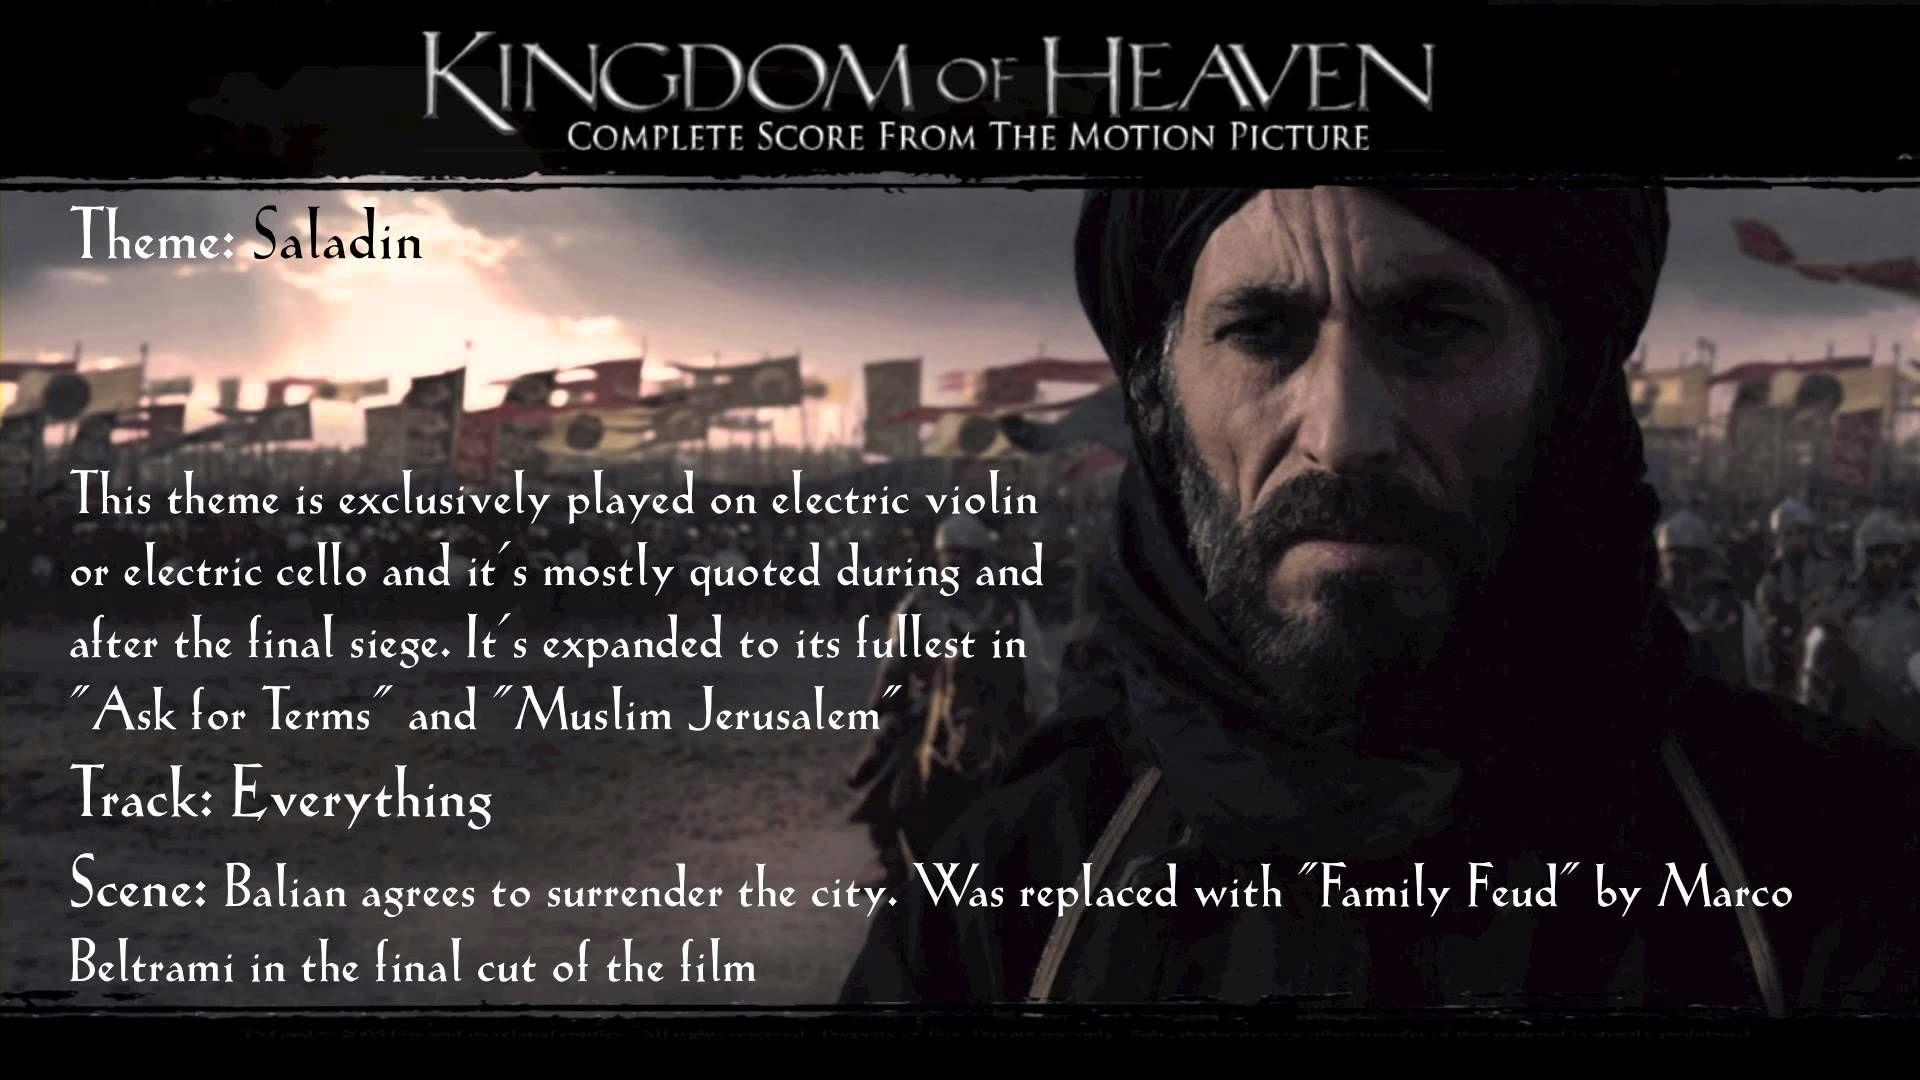 Kingdom Of Heaven Soundtrack Themes Saladin Youtube Kingdom Of Heaven Heaven Quotes Favorite Movie Quotes